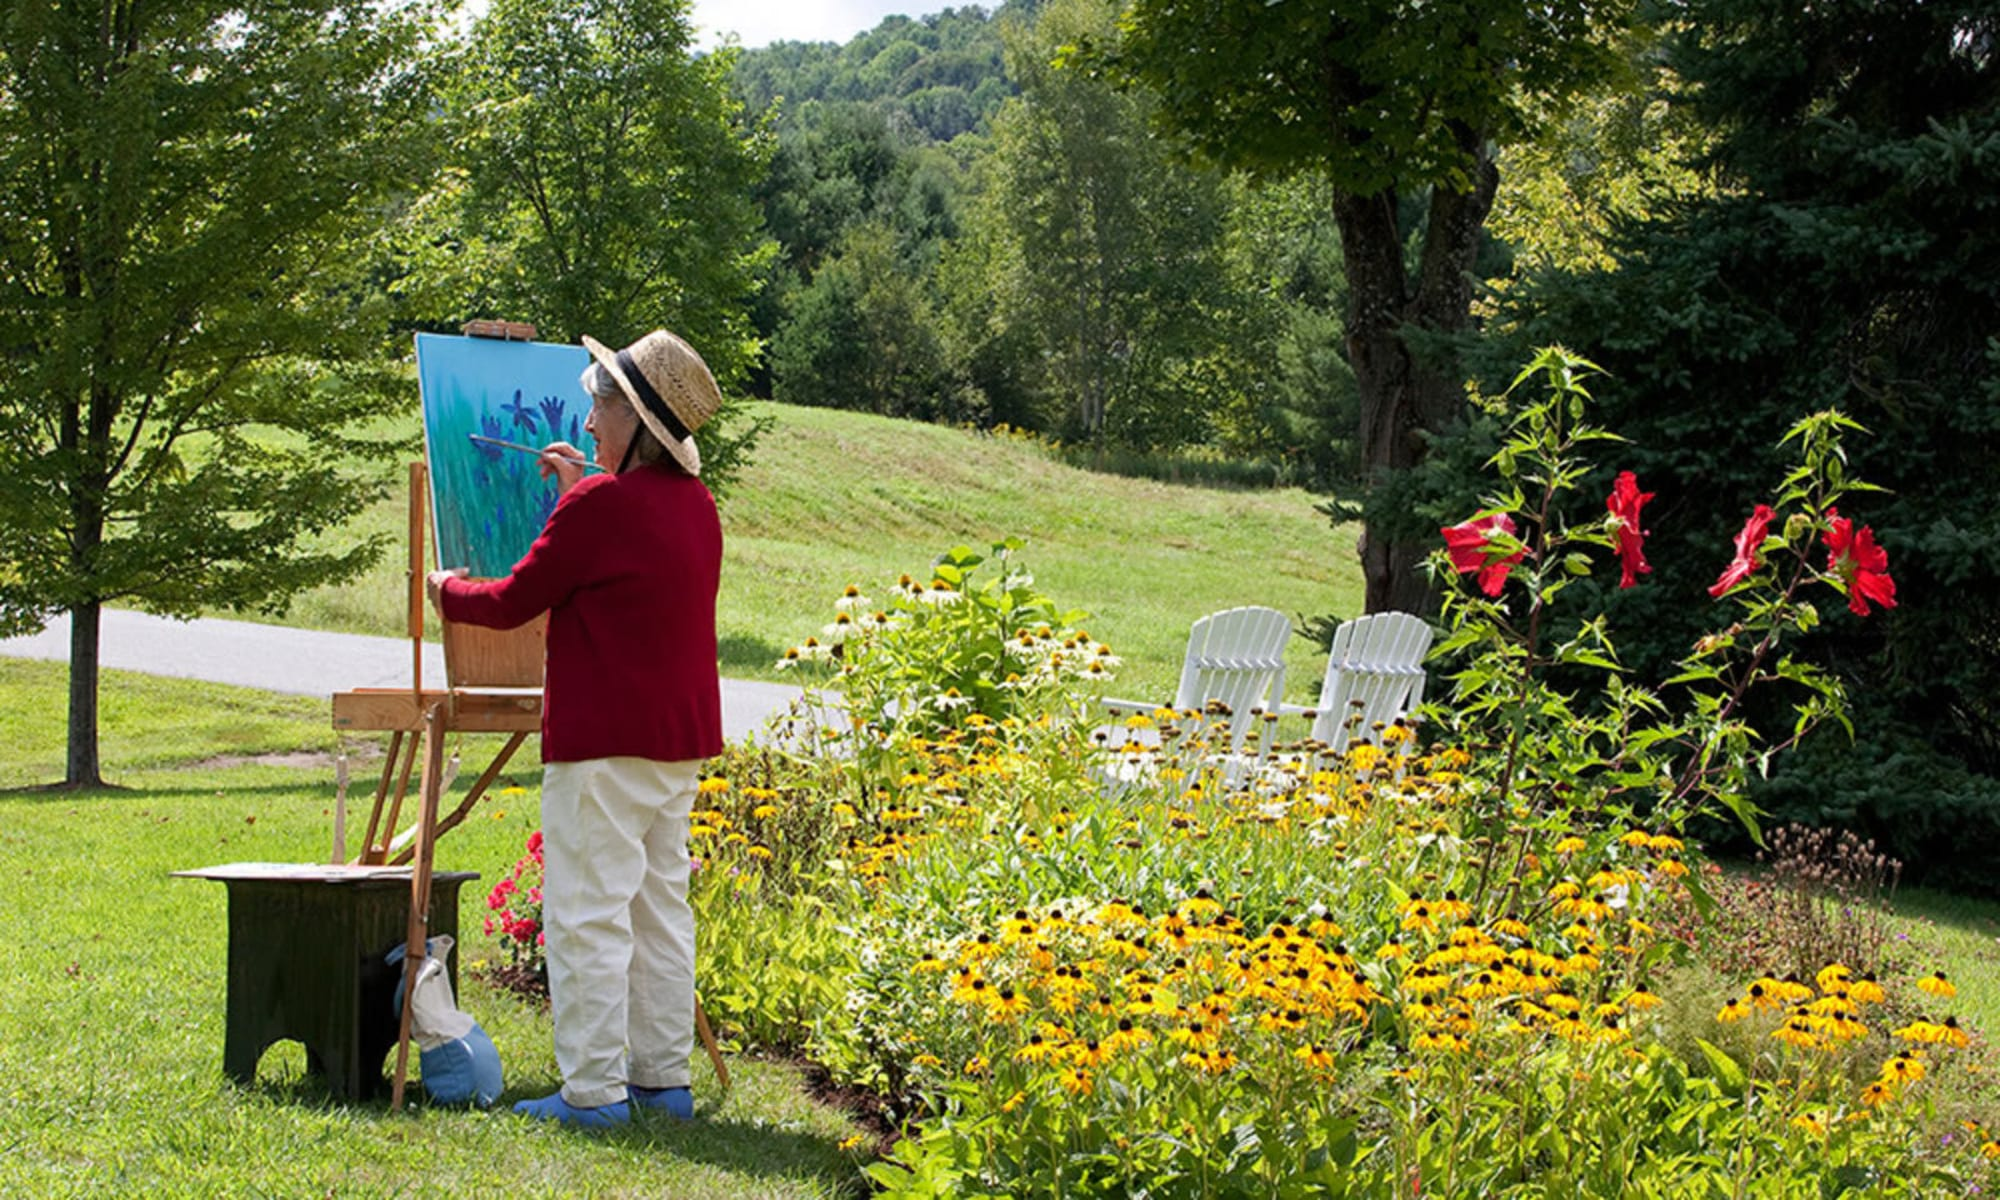 Senior living at Valley Terrace in White River Junction, Vermont